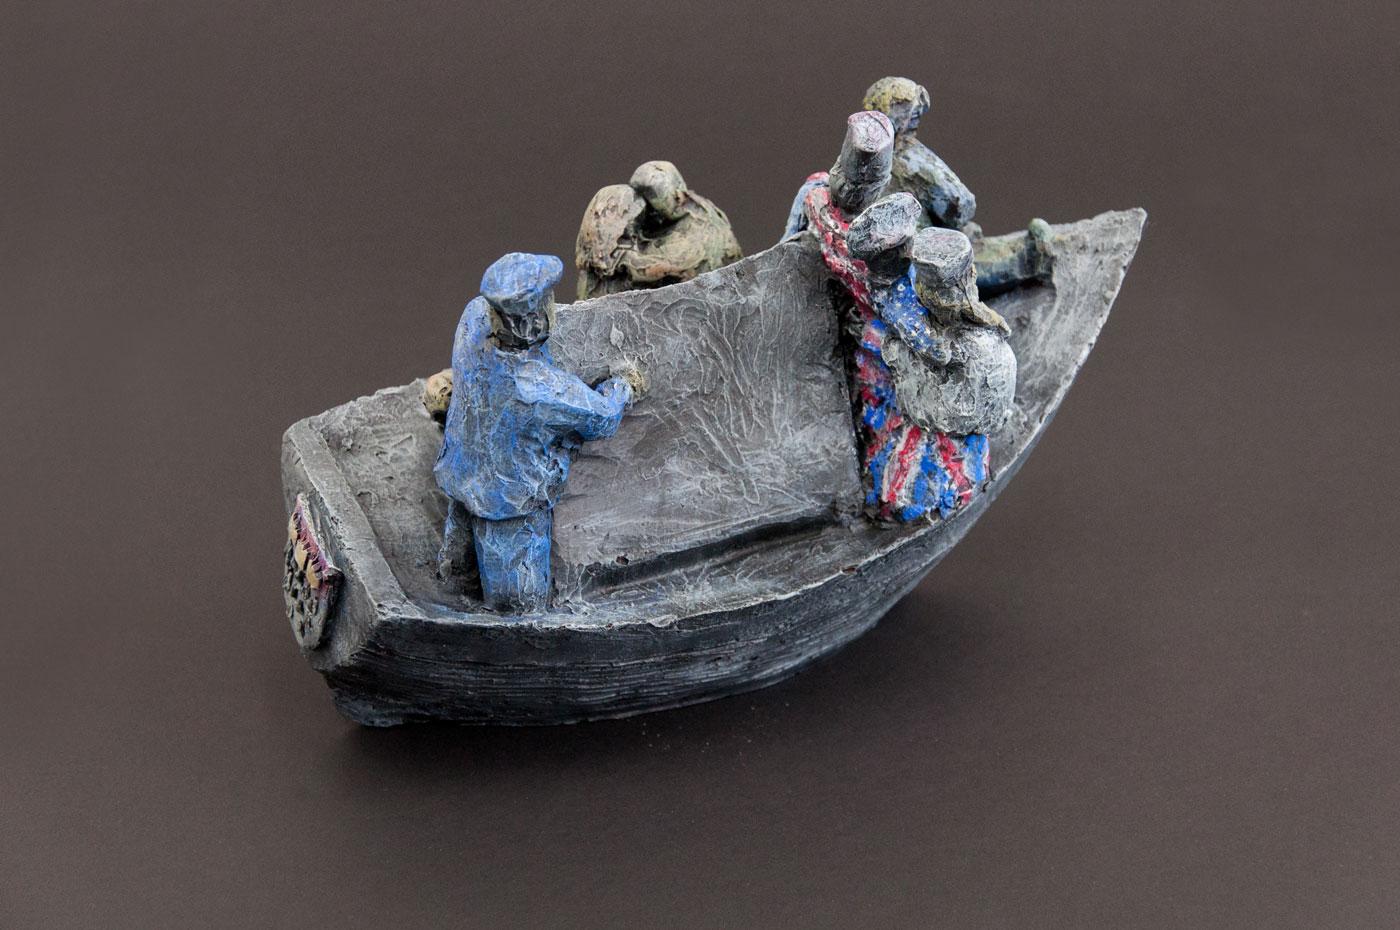 TRIZONESIEN SHIP, © 2015, acrylic cast, acrylic paint, 25 x 18 x 12 cm